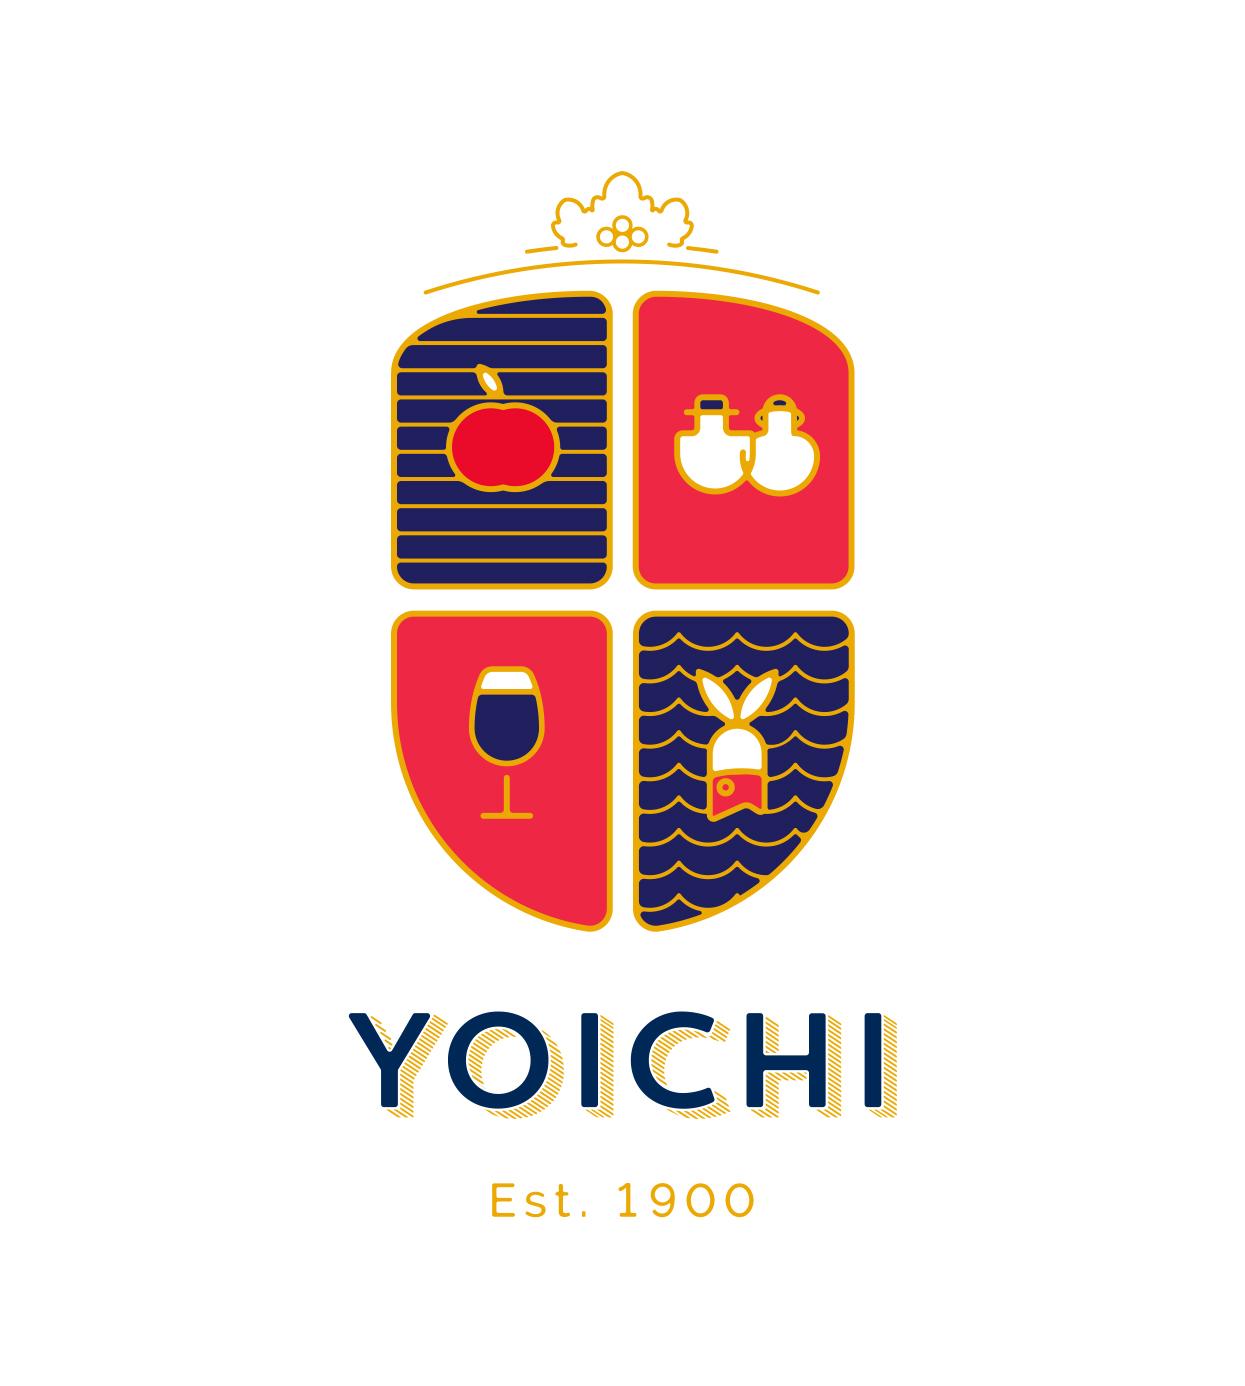 City of Yoichi